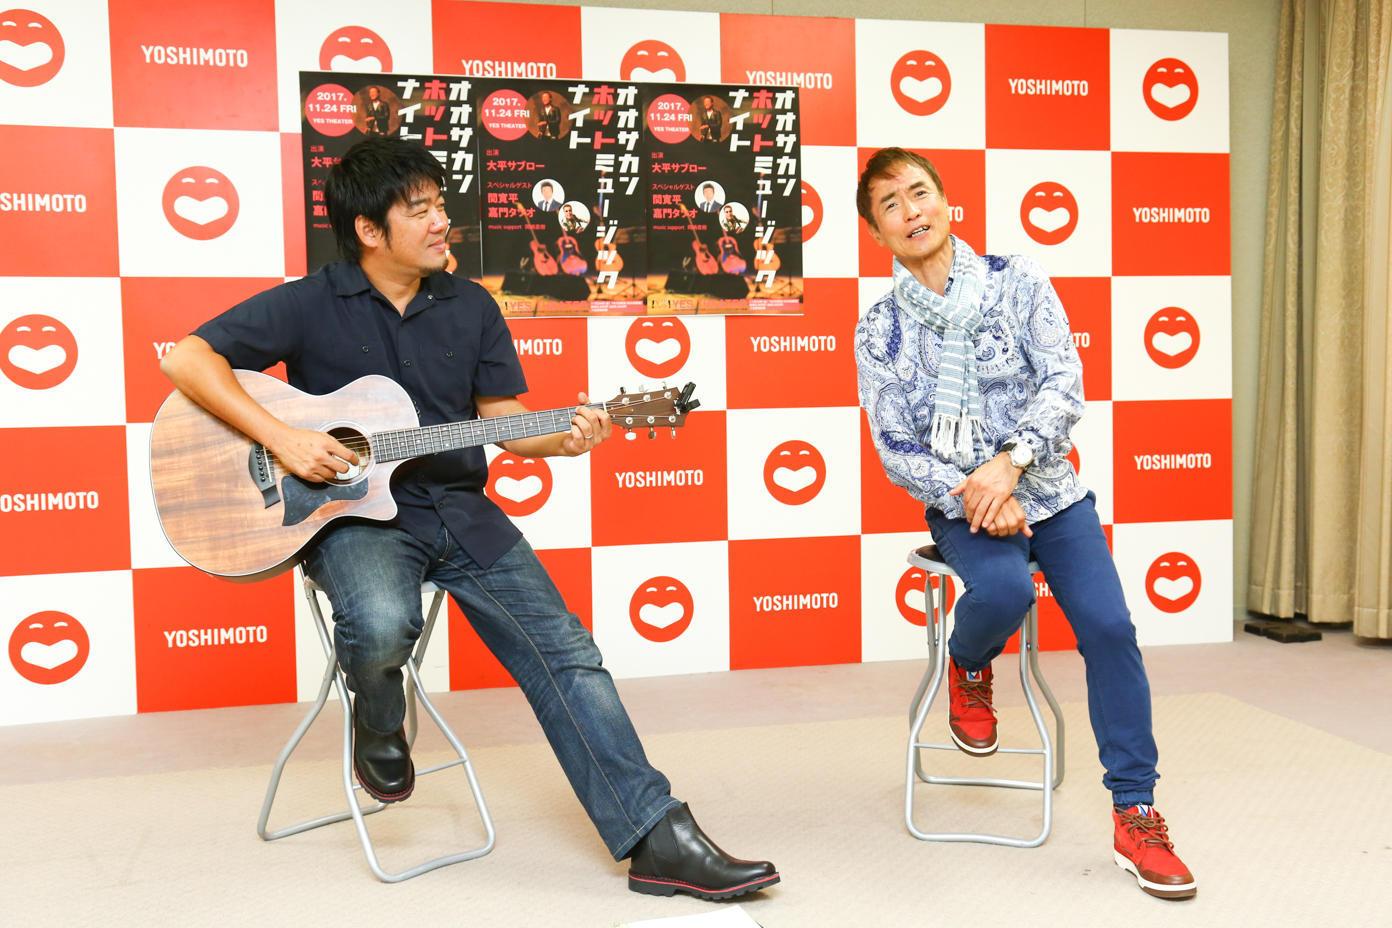 http://news.yoshimoto.co.jp/20170929093023-786b56494c33574052276d8b7066a8b27d65fb43.jpg